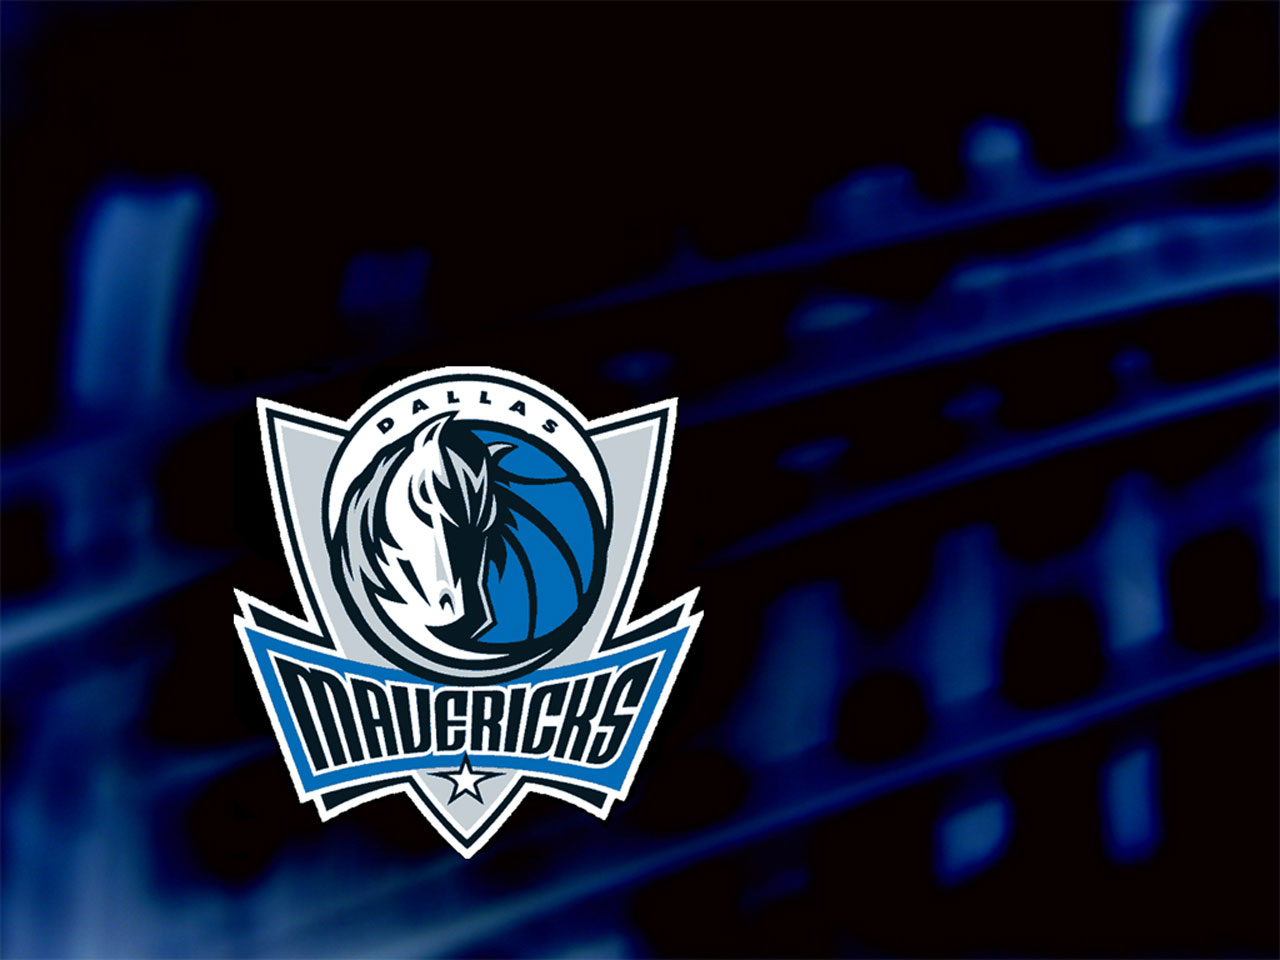 Dallas Mavericks Wallpaper, Awesome 47 Dallas Mavericks Wallpapers